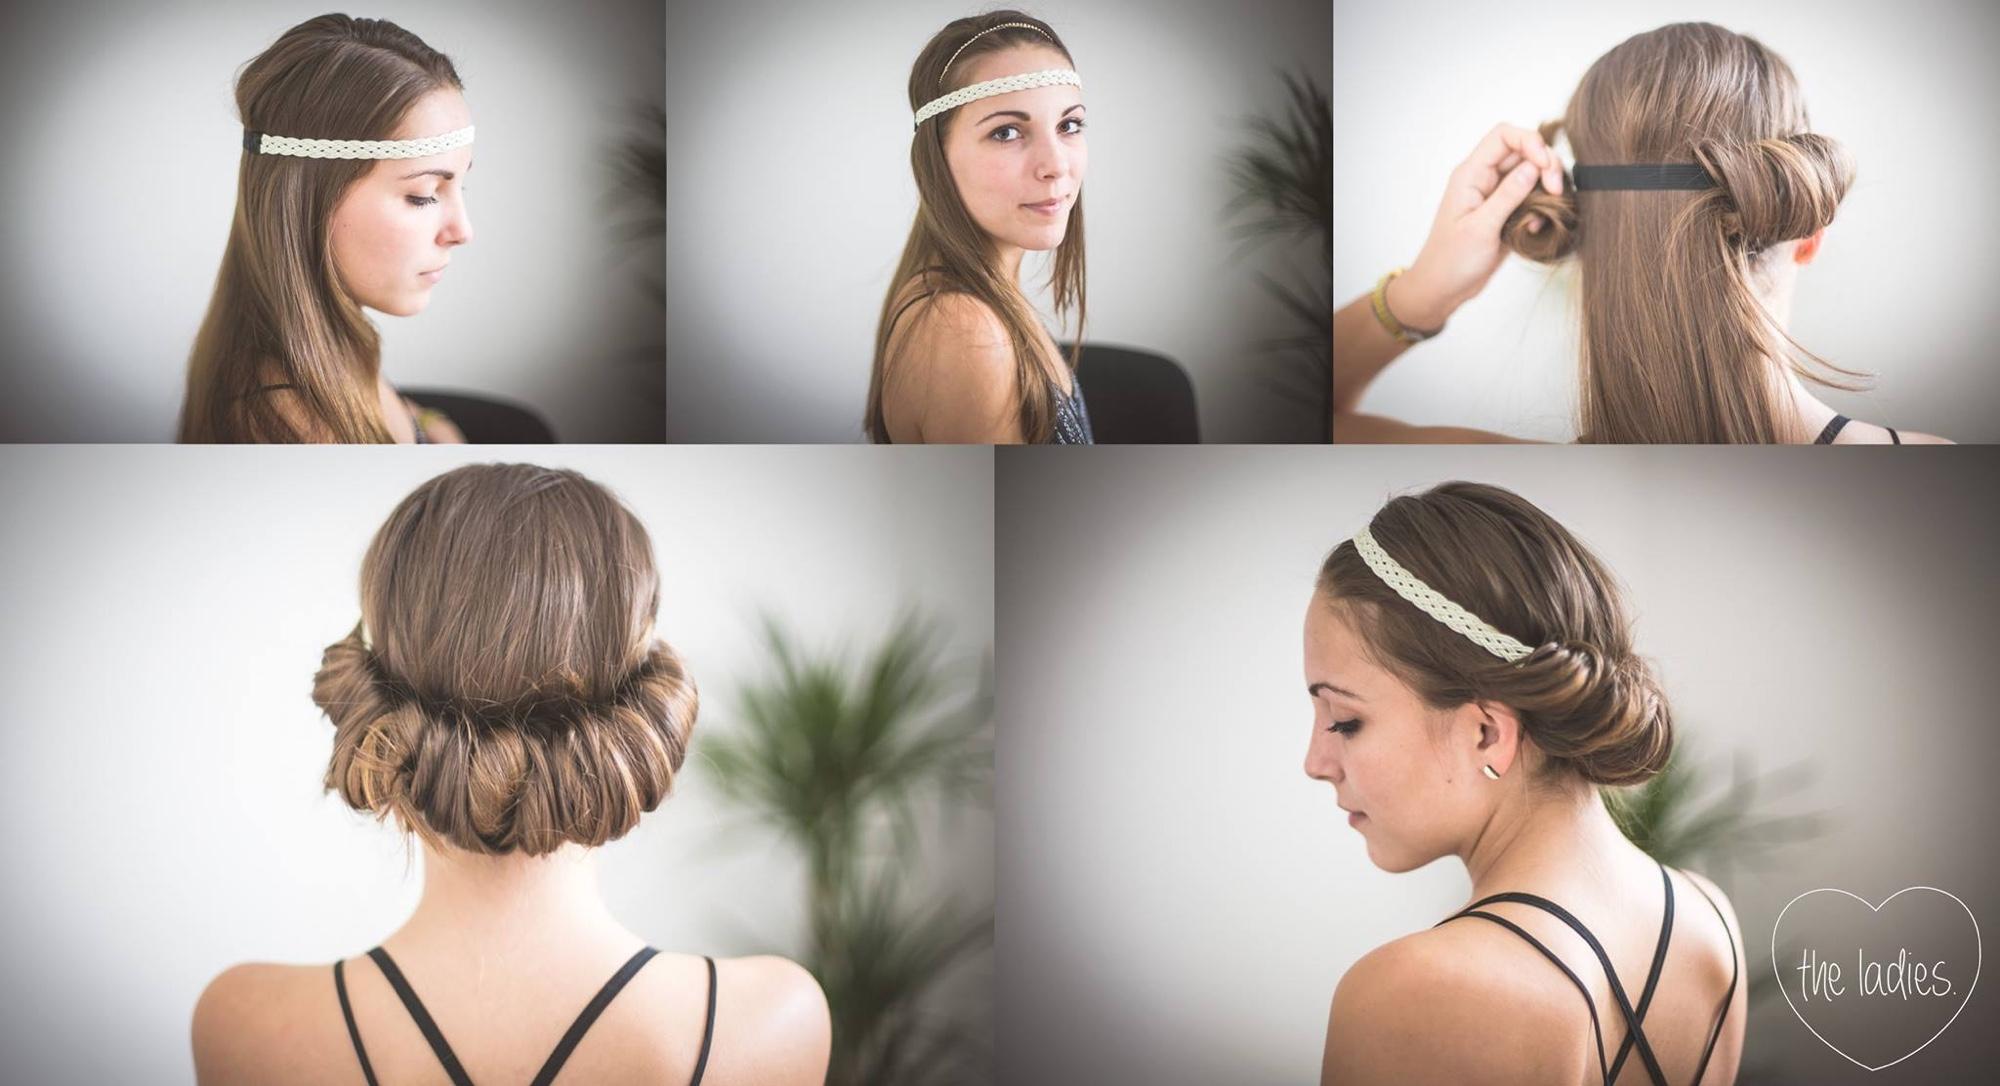 Frisur Haarband Eindrehen Haarschnitt Lange Haare